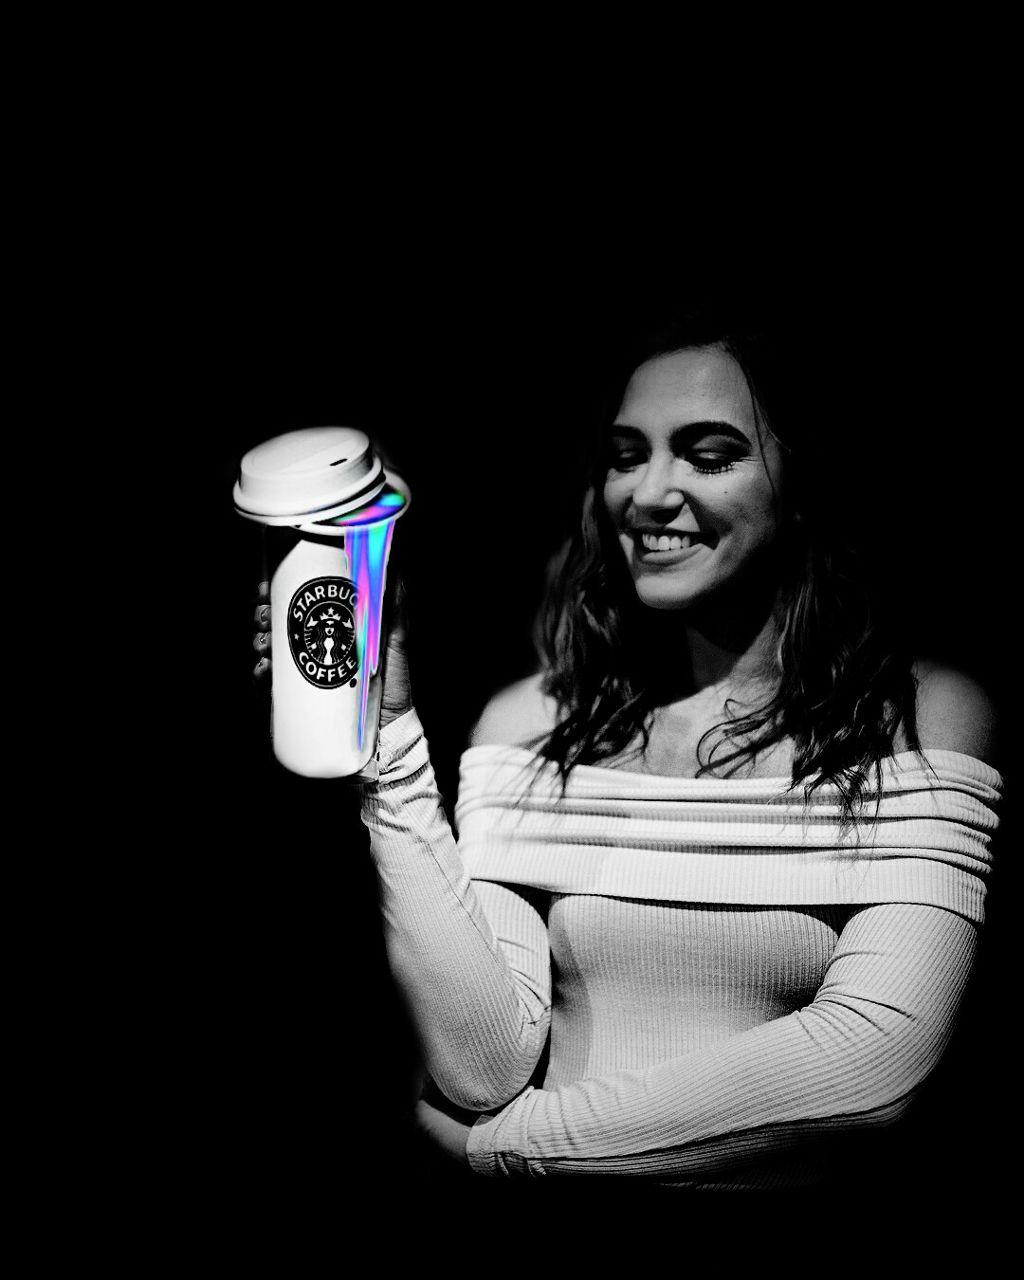 #freetoedit #coffee #pcblackbackground #holographic #beatiful #nice #eccolorsplasheffect